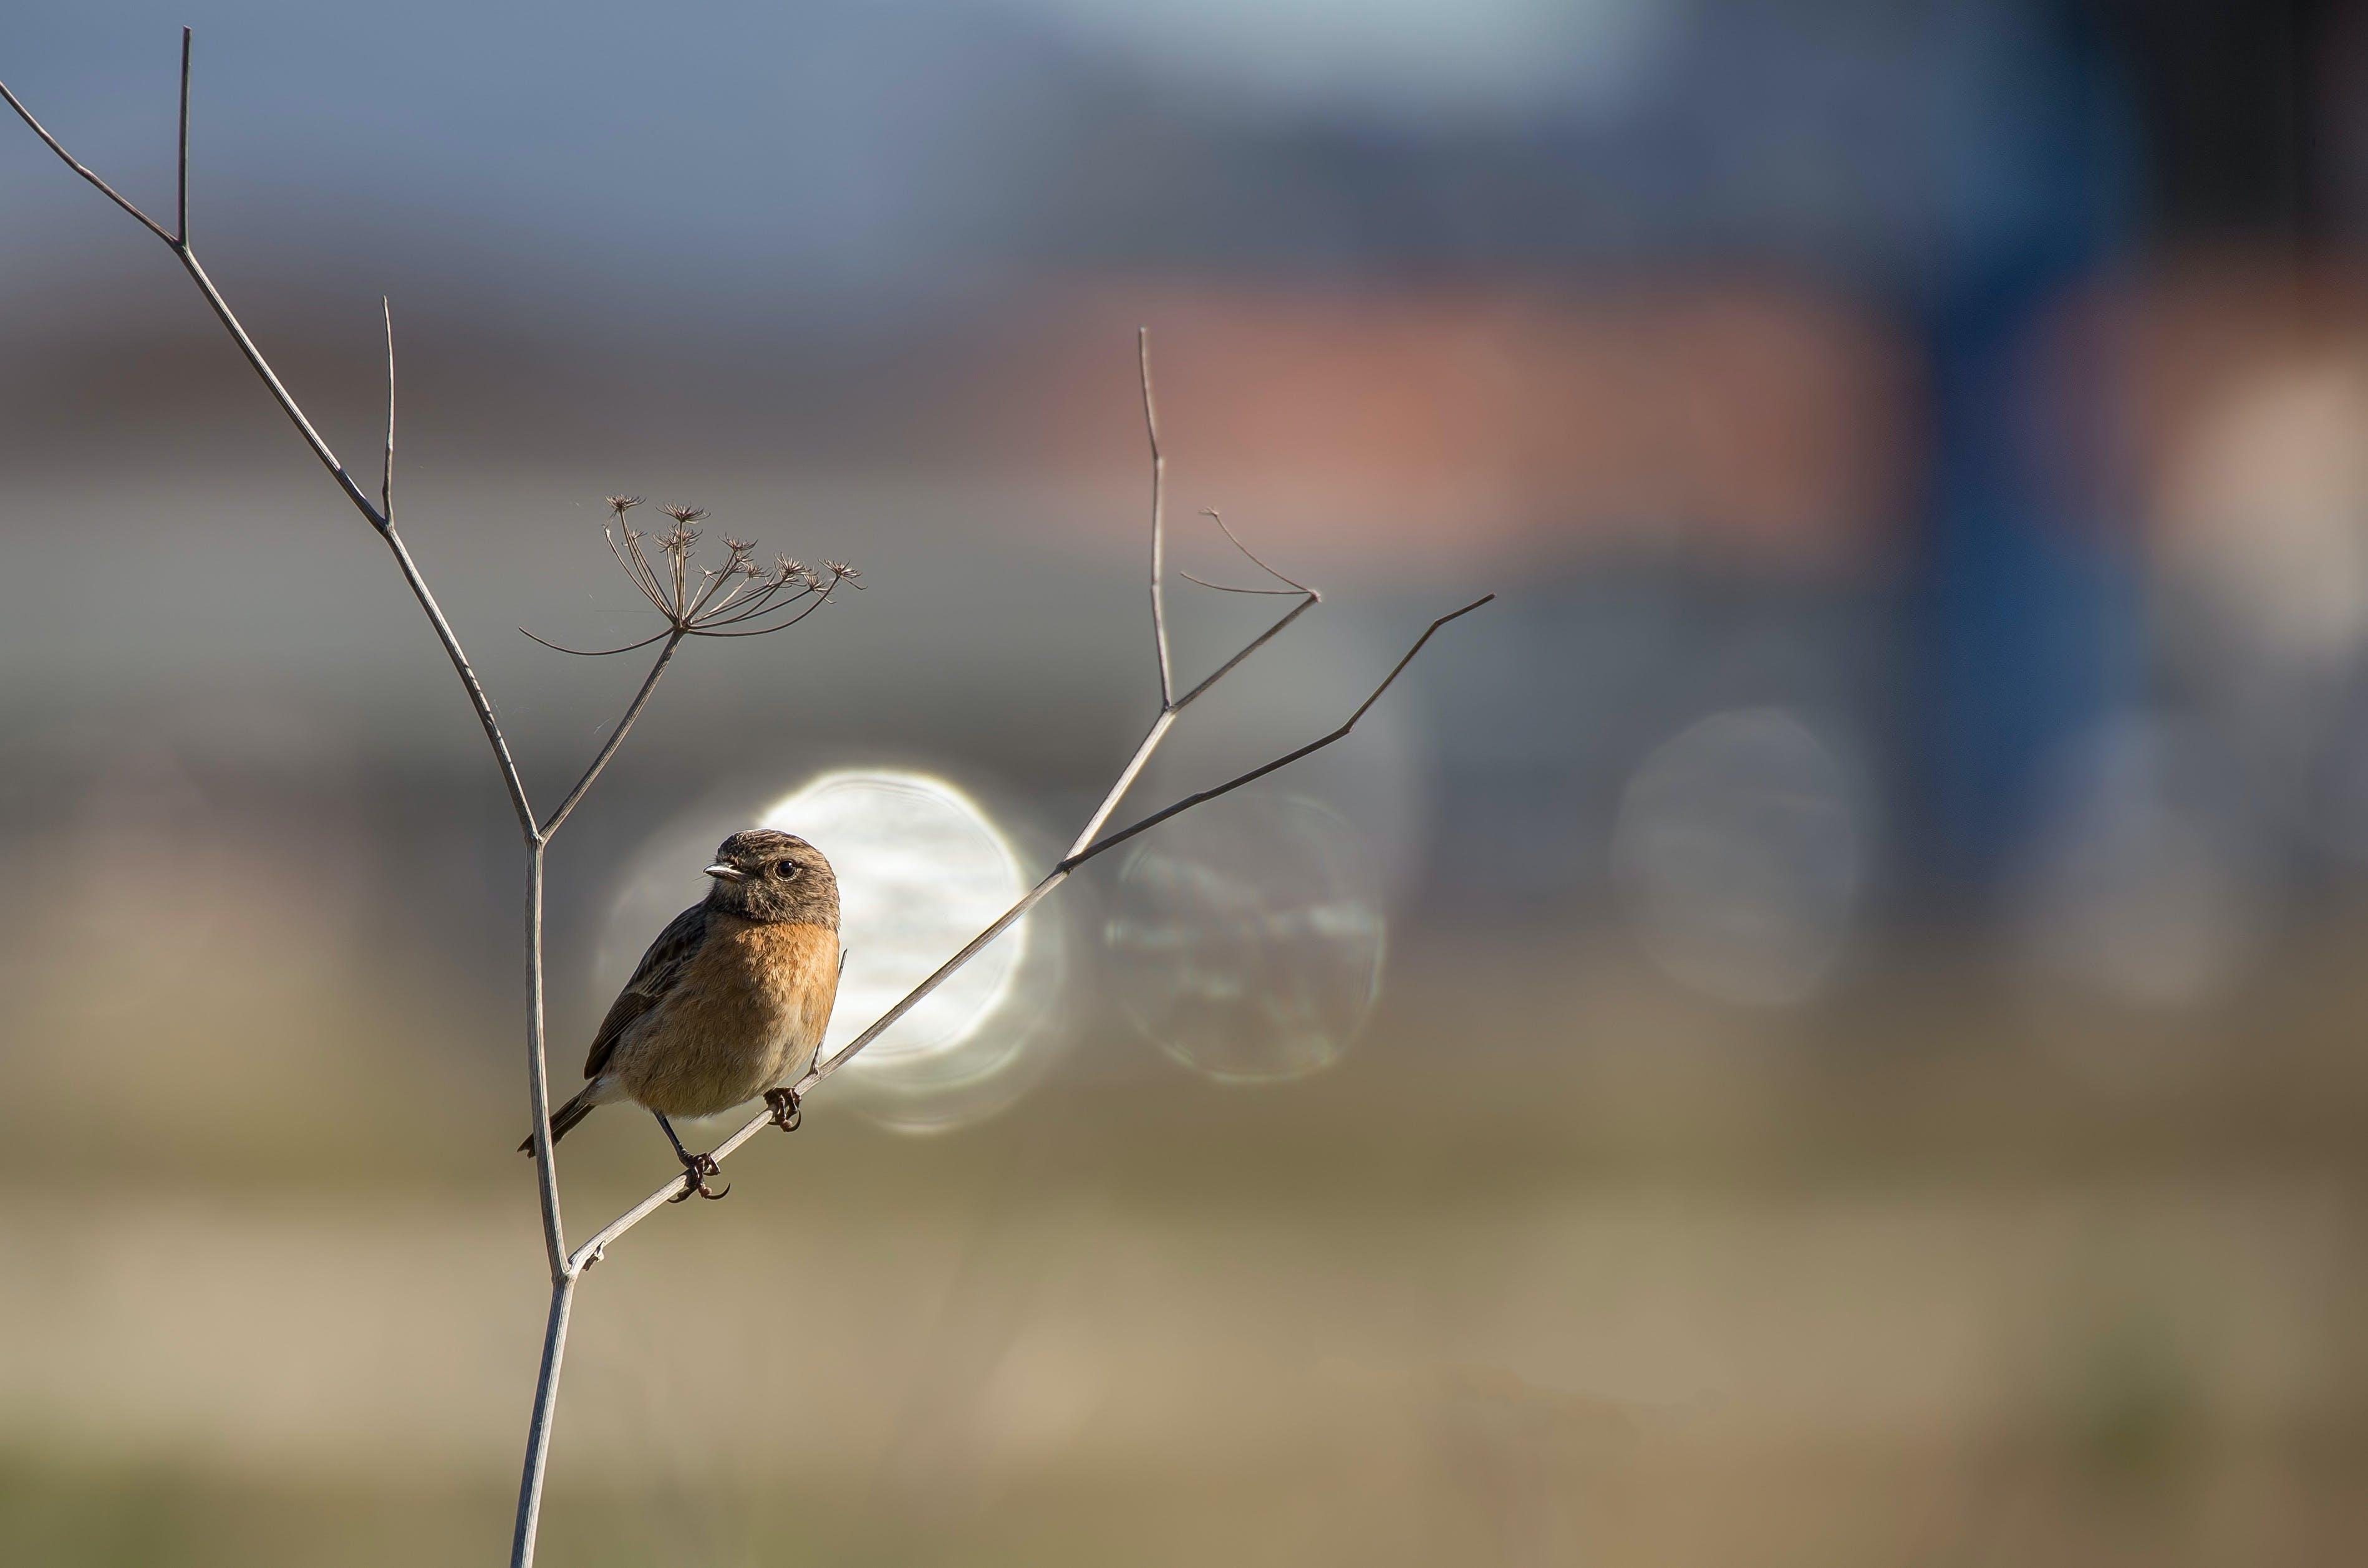 Free stock photo of bird, nature photography